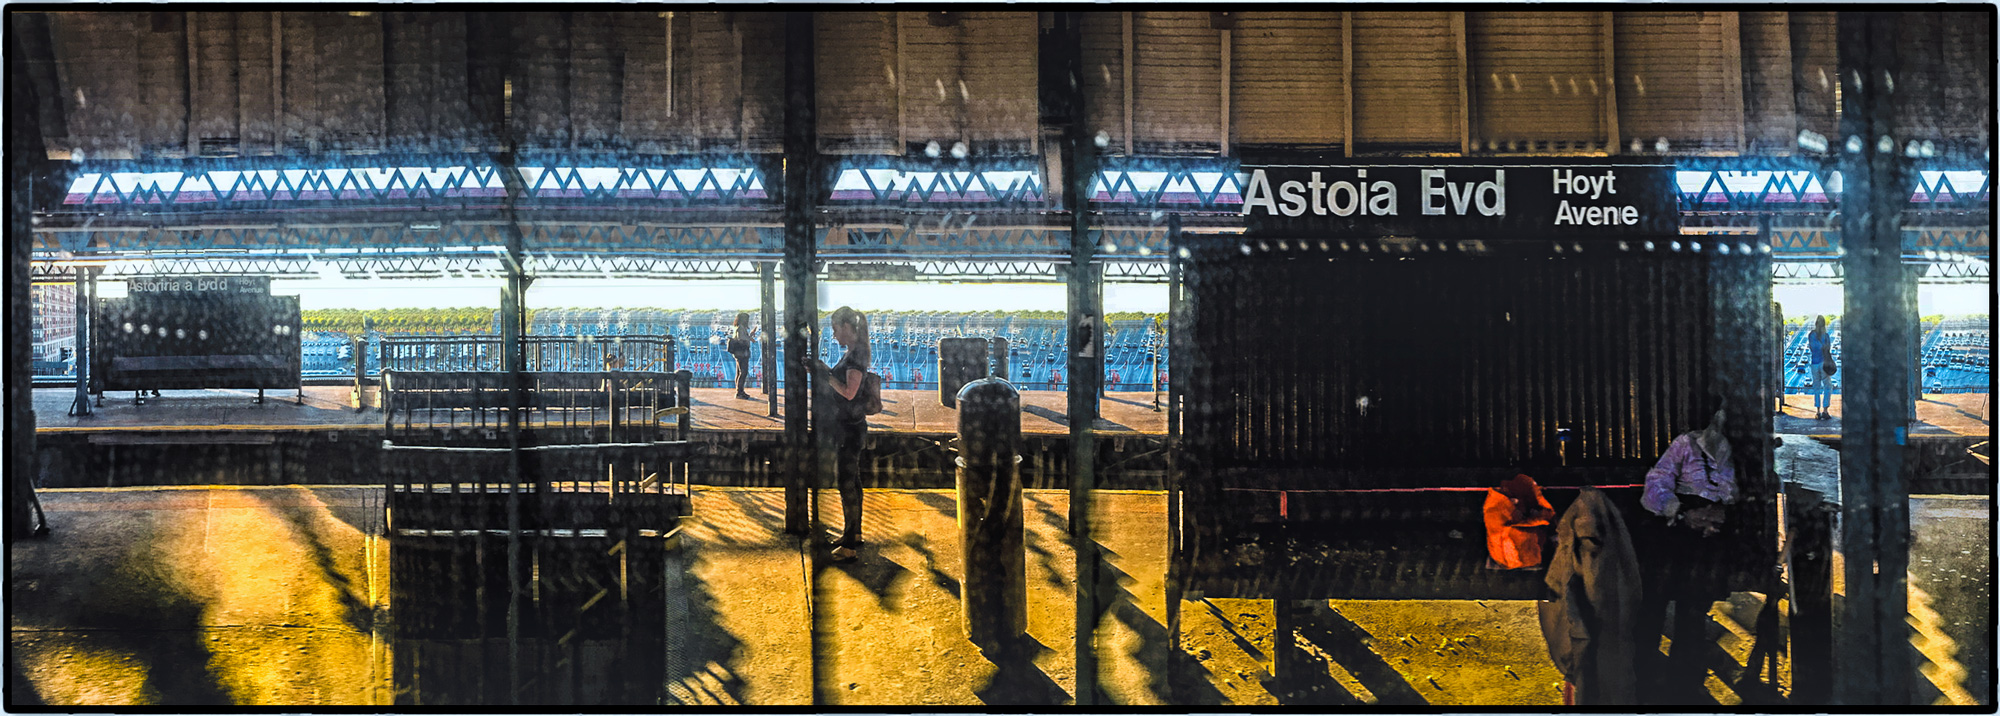 2016_Mobile_Subway_0066.jpg